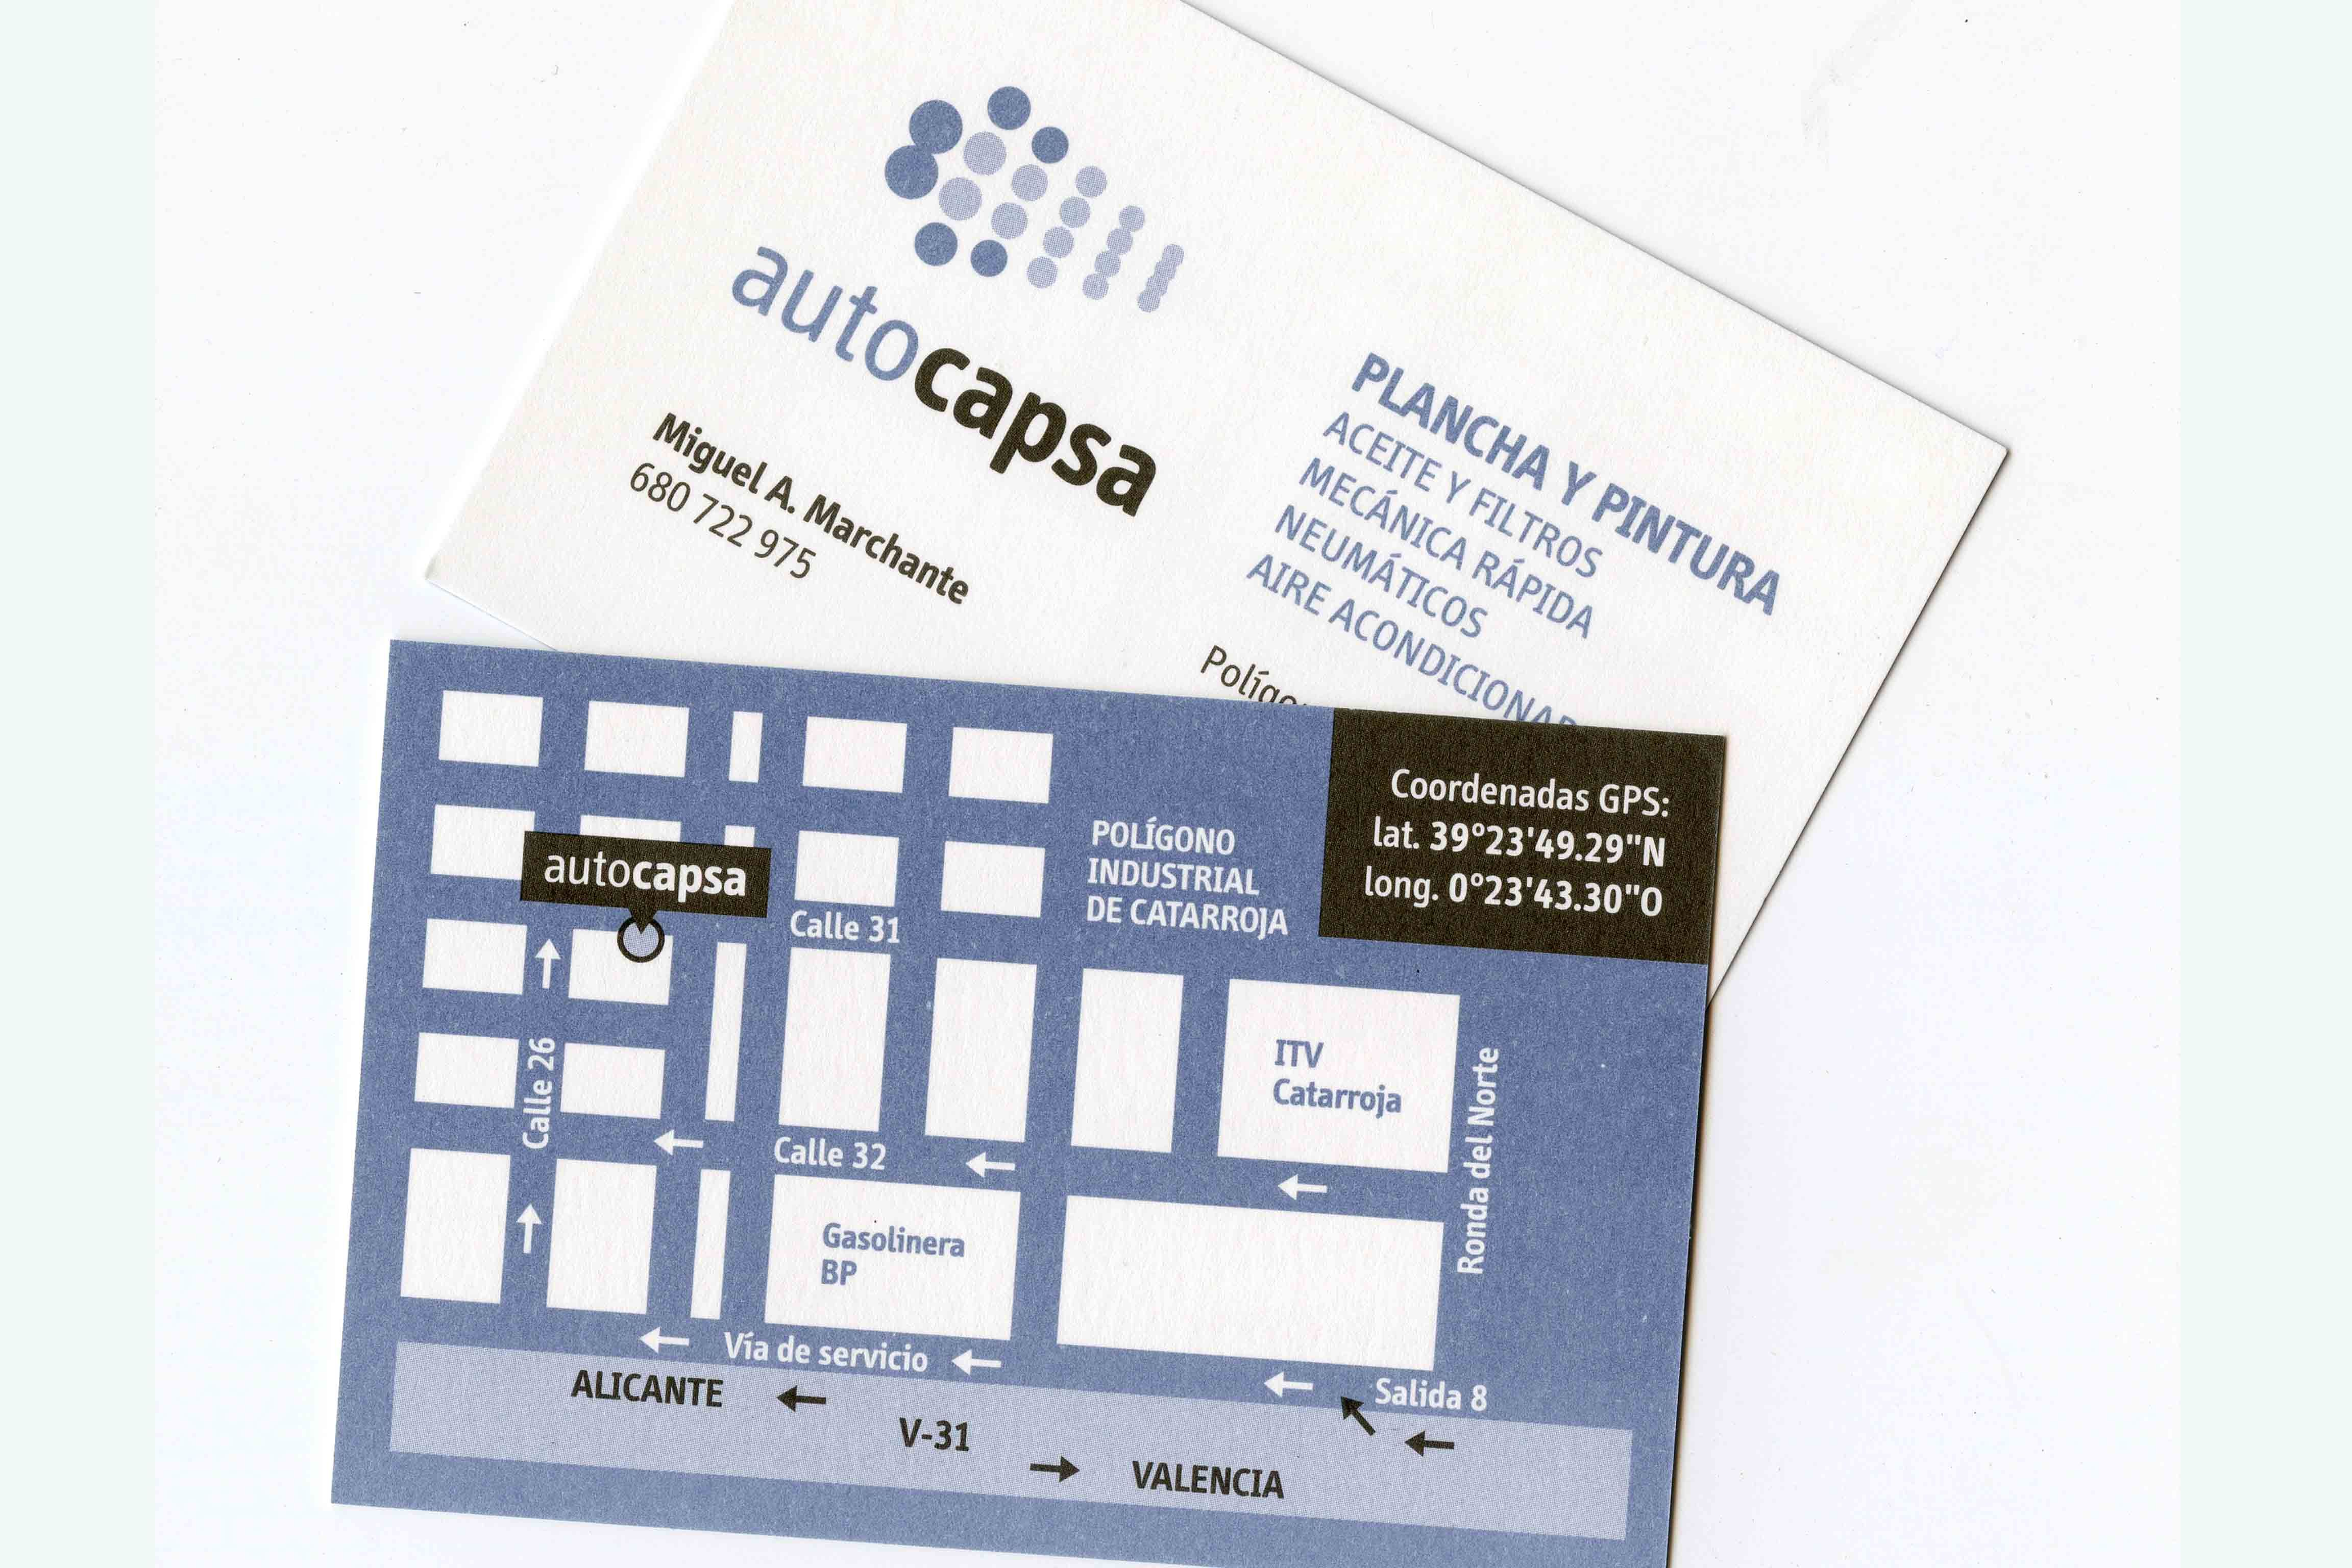 Foto 4 de Talleres de chapa y pintura en Catarroja | Talleres Autocapsa